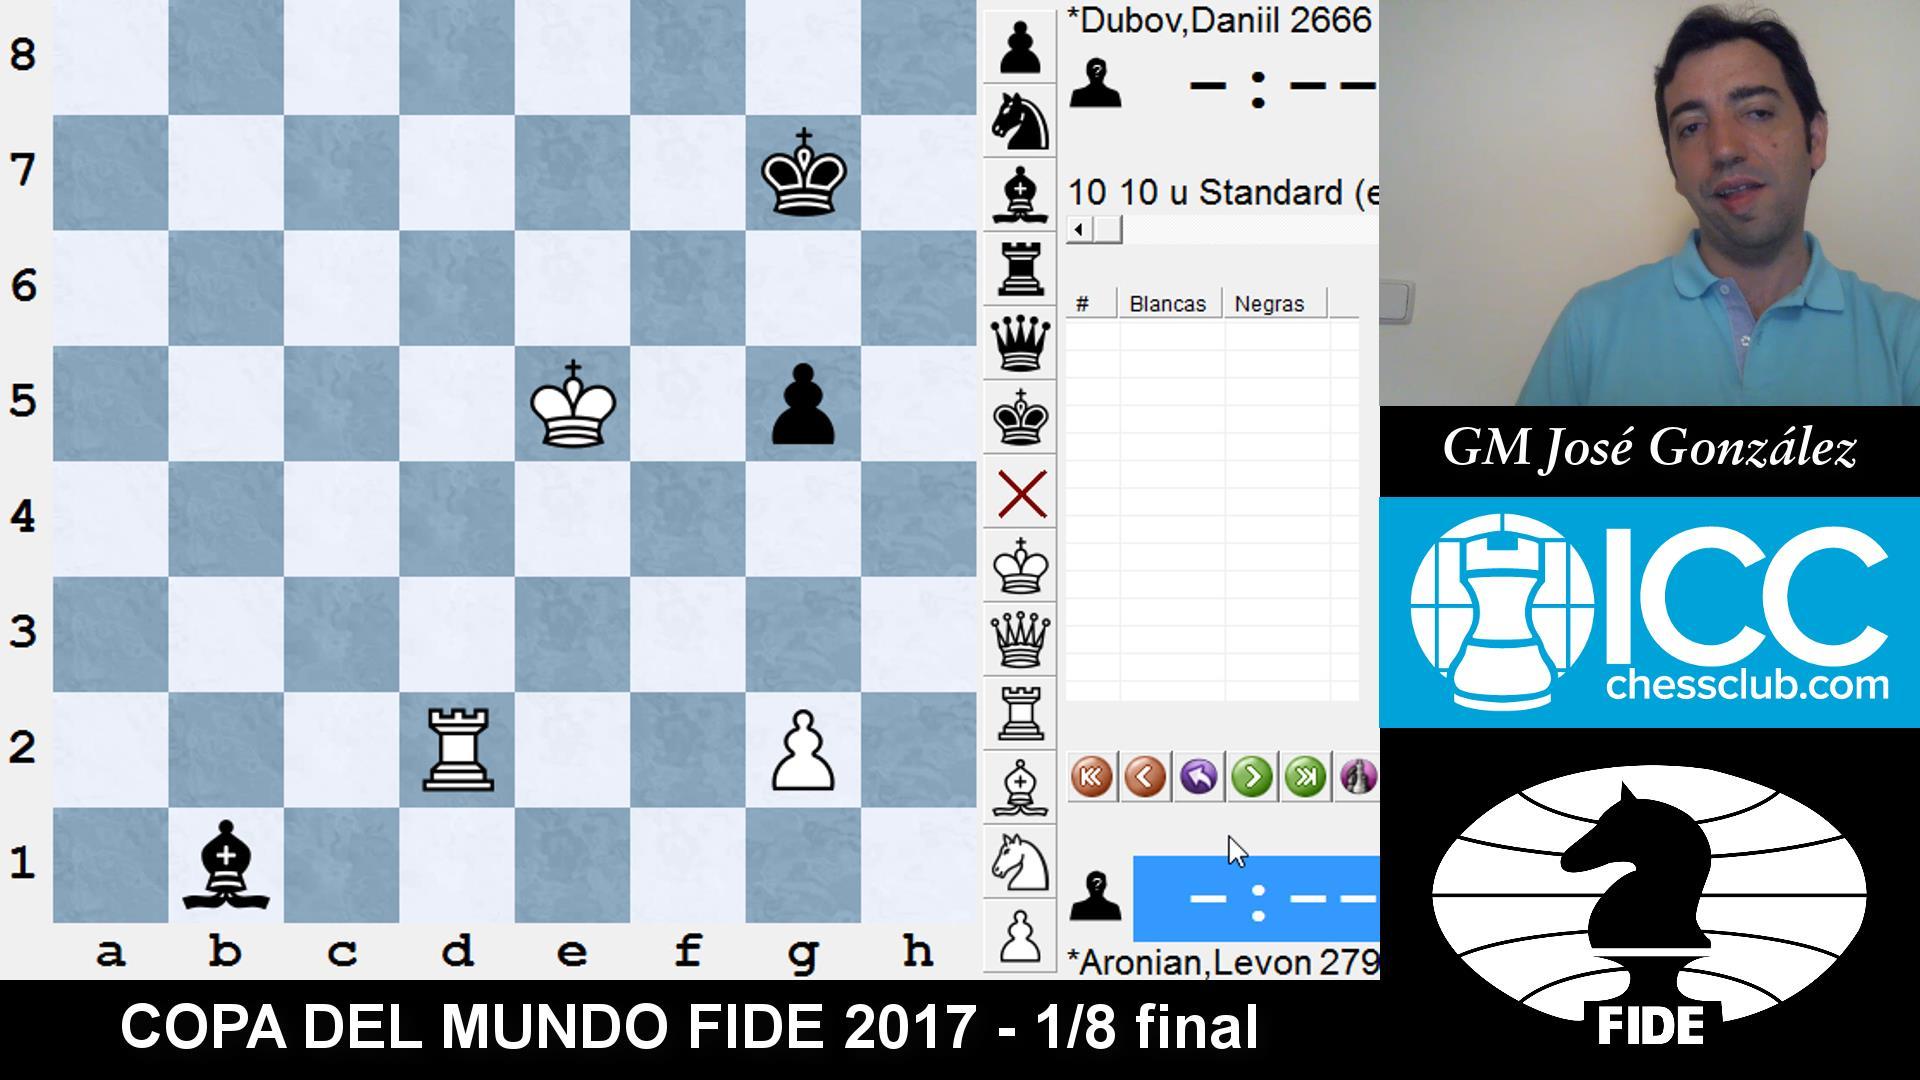 COPA DEL MUNDO FIDE 2017 - Resumen 1/8 final (GM José González)